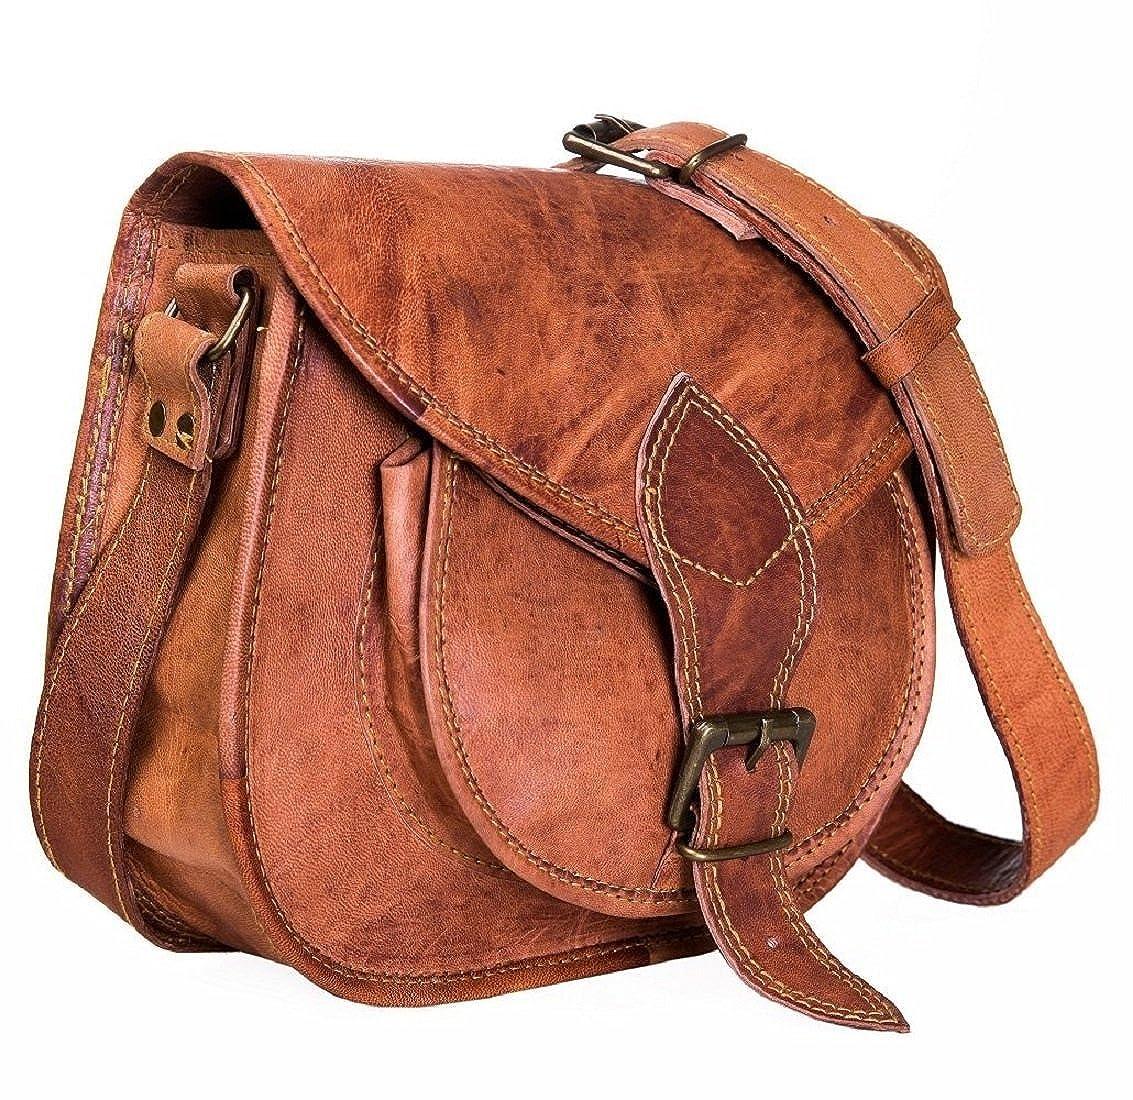 58df263000e4 LS Handbag Crossbody Tote Saddle Satchel Bag Shoulder Purse for ...